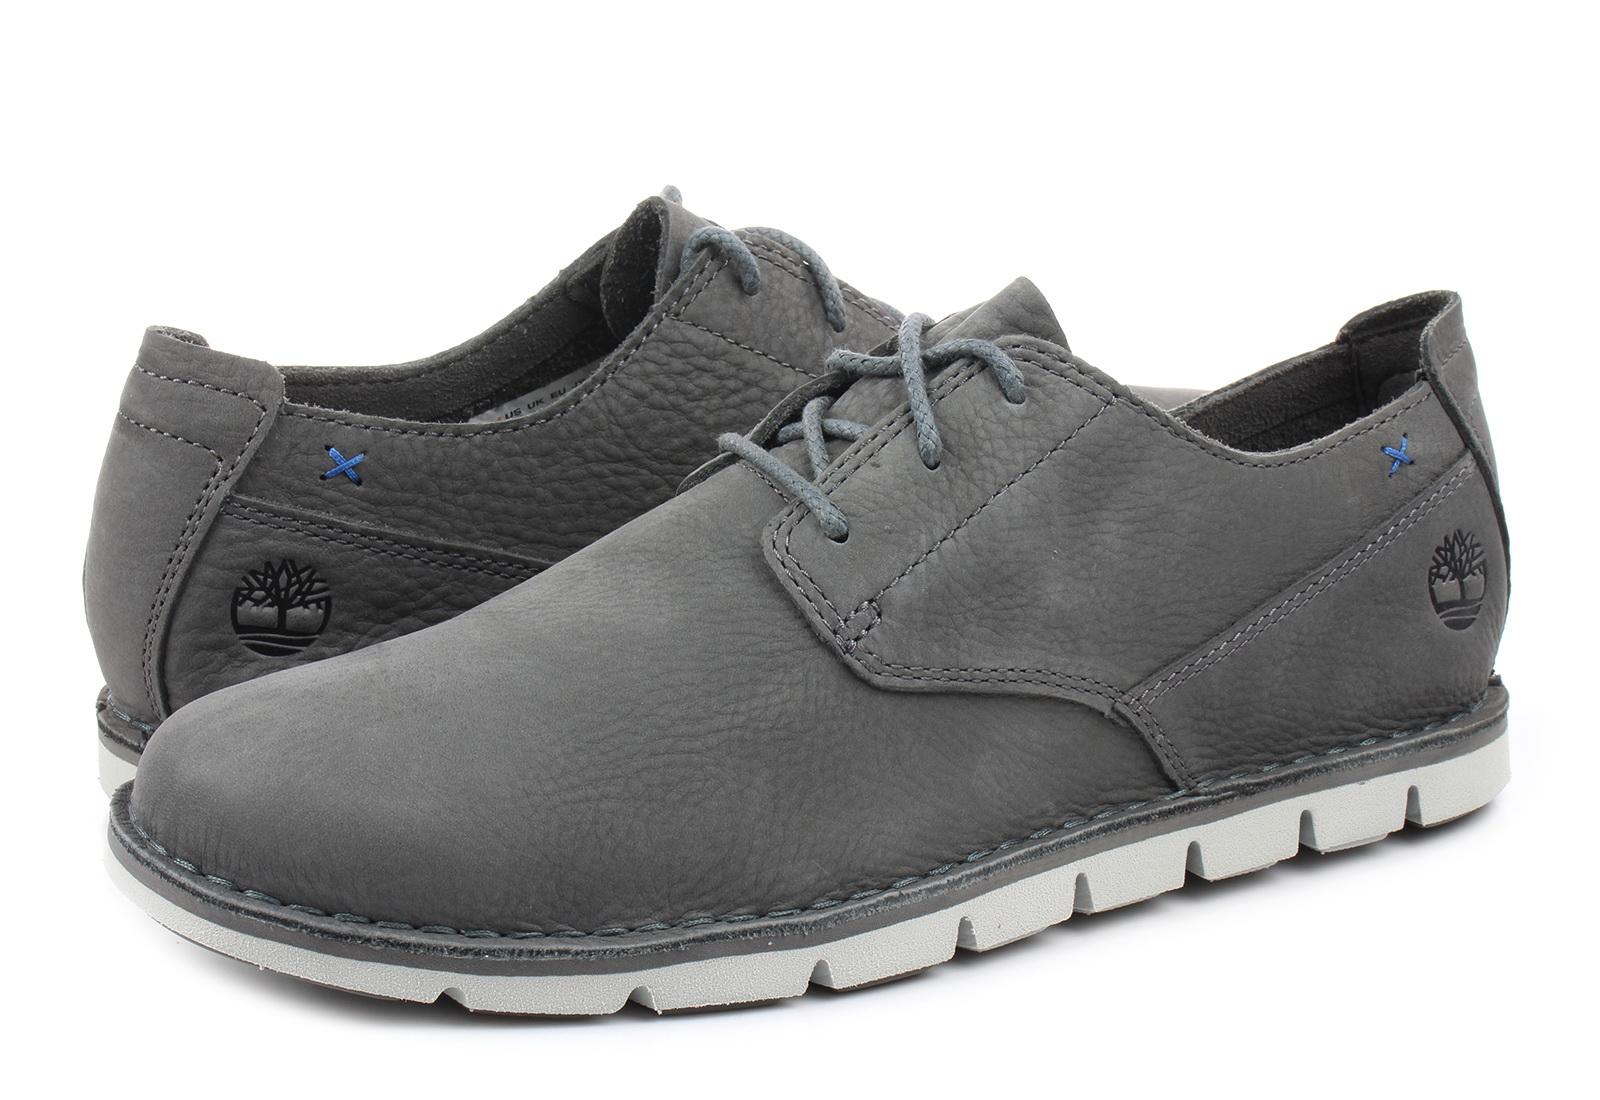 Divatos cipők kiránduláshoz